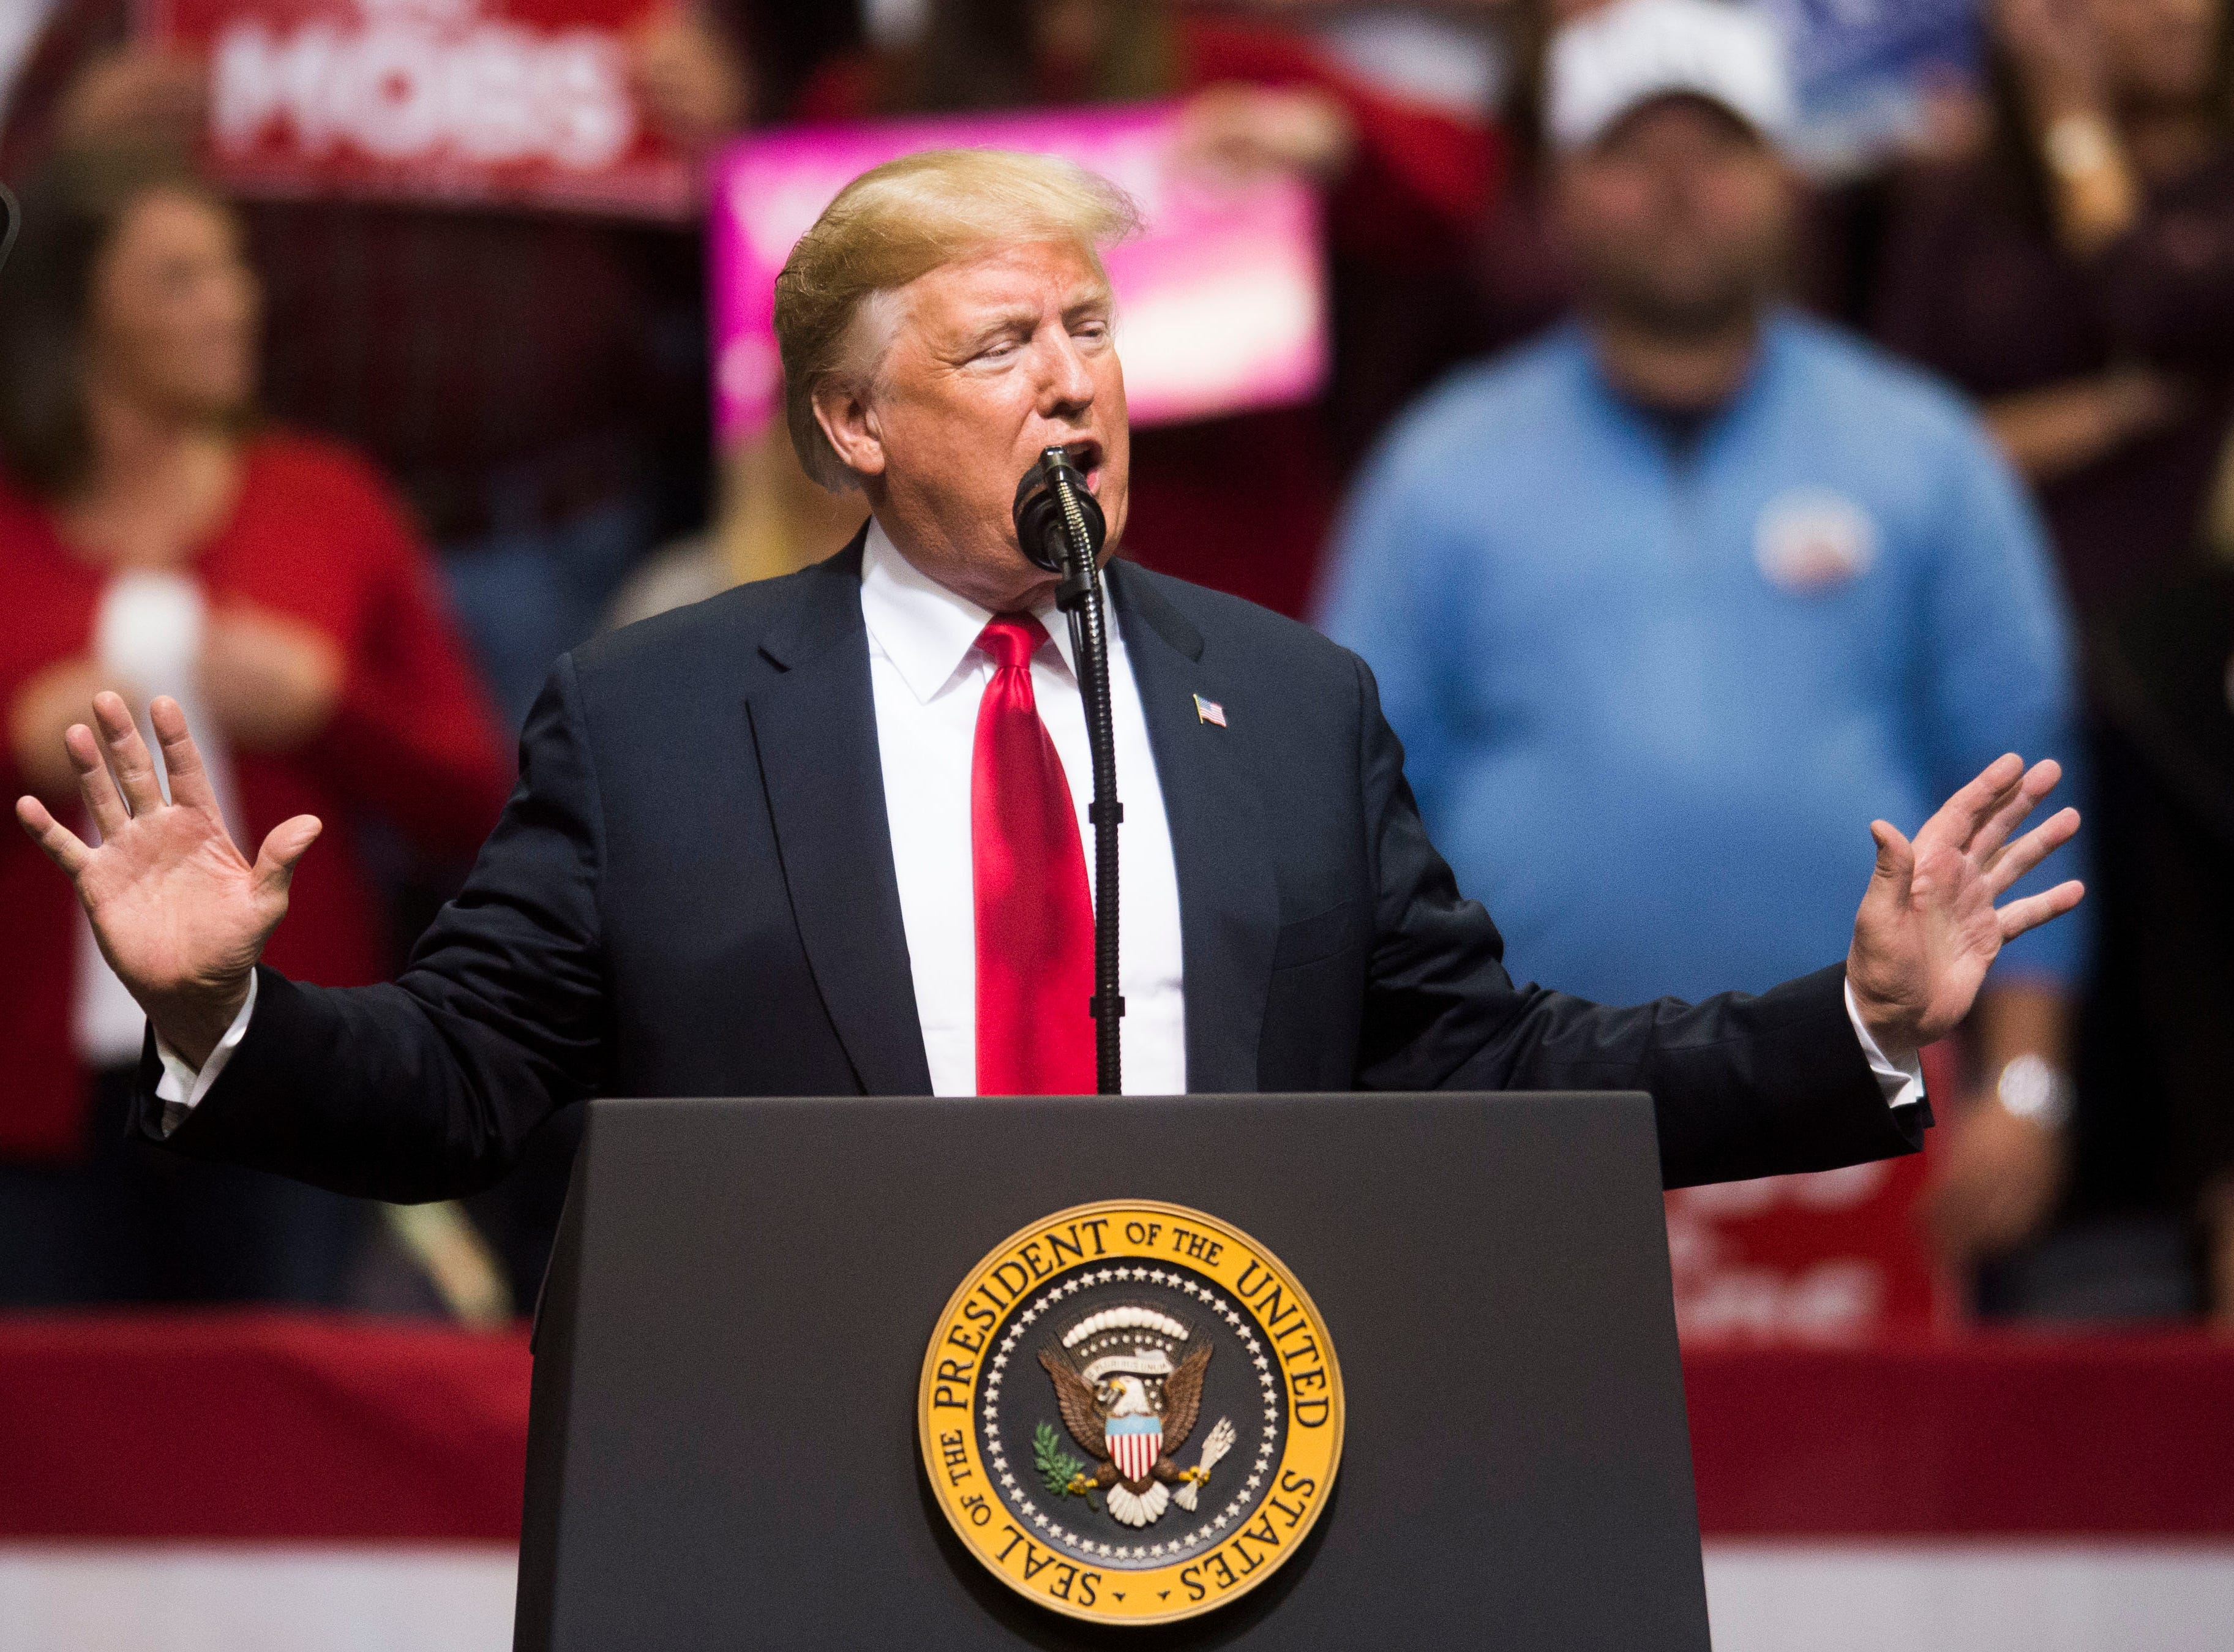 President Donald Trump speaks in support of U.S. Rep. Marsha Blackburn for the U.S. Senate at McKenzie Arena in Chattanooga, Sunday, Nov. 4, 2018.